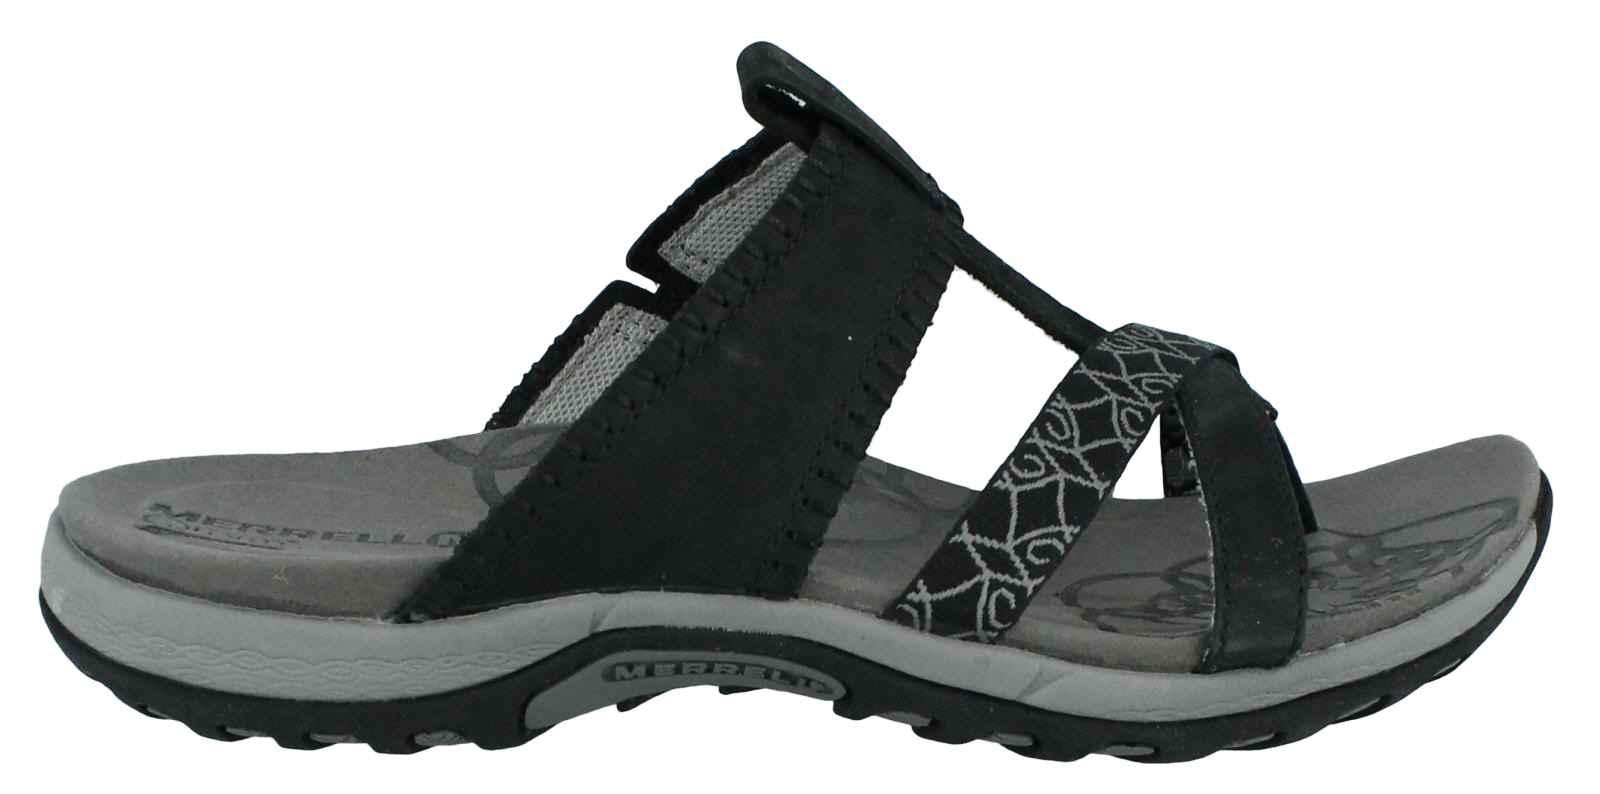 MERRELL Avian Light Strap Ladies Sandals, Brindle, UK8